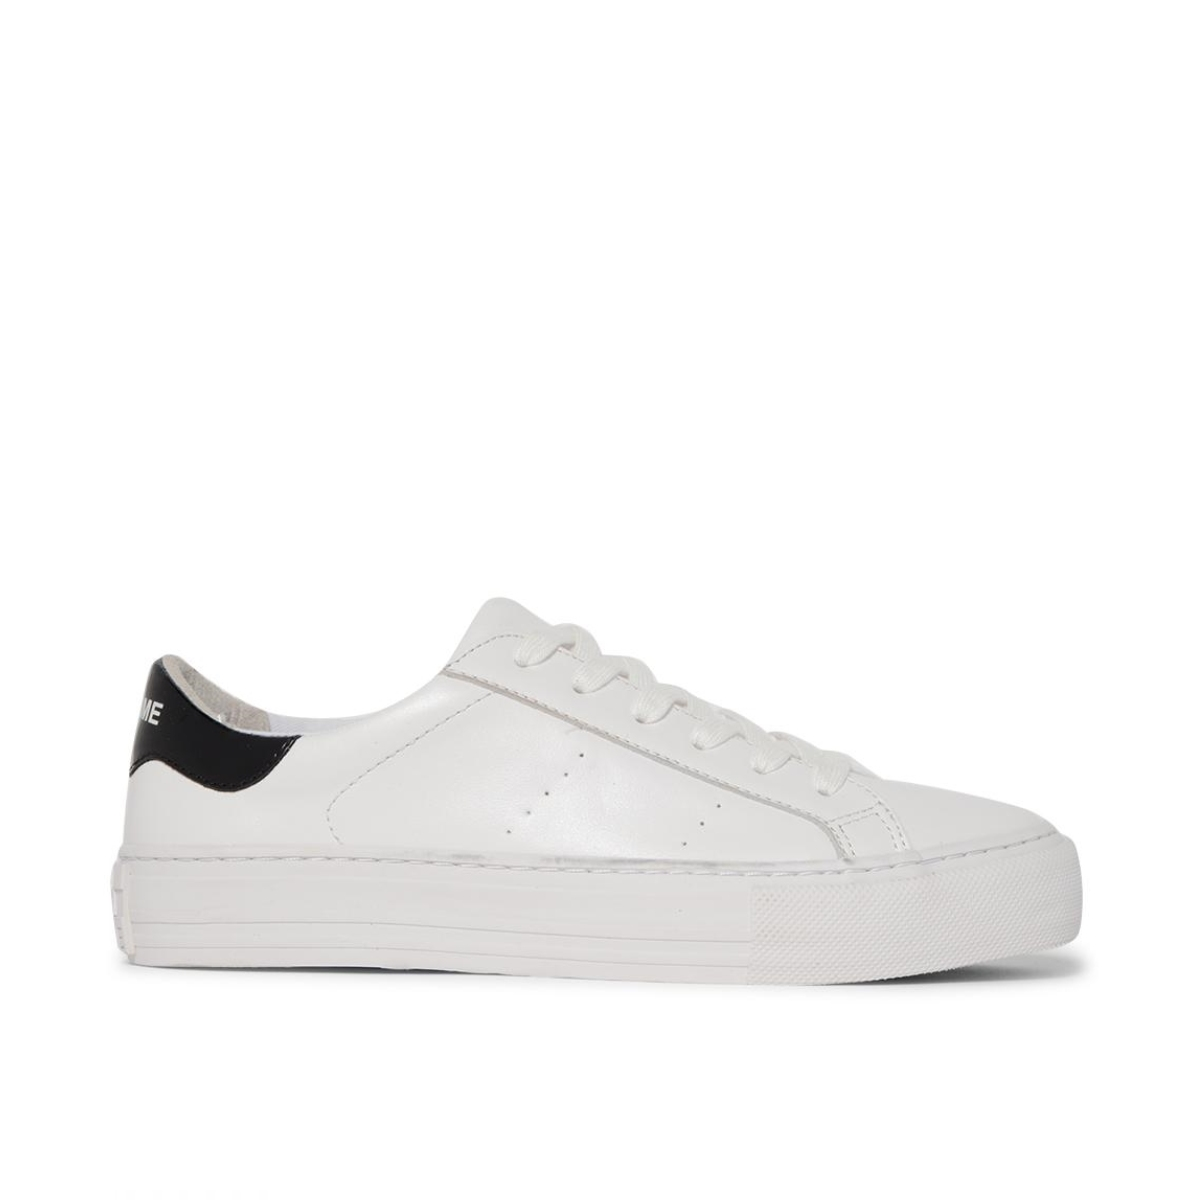 ARCADE-11150-WHITE アルカデ ホワイト